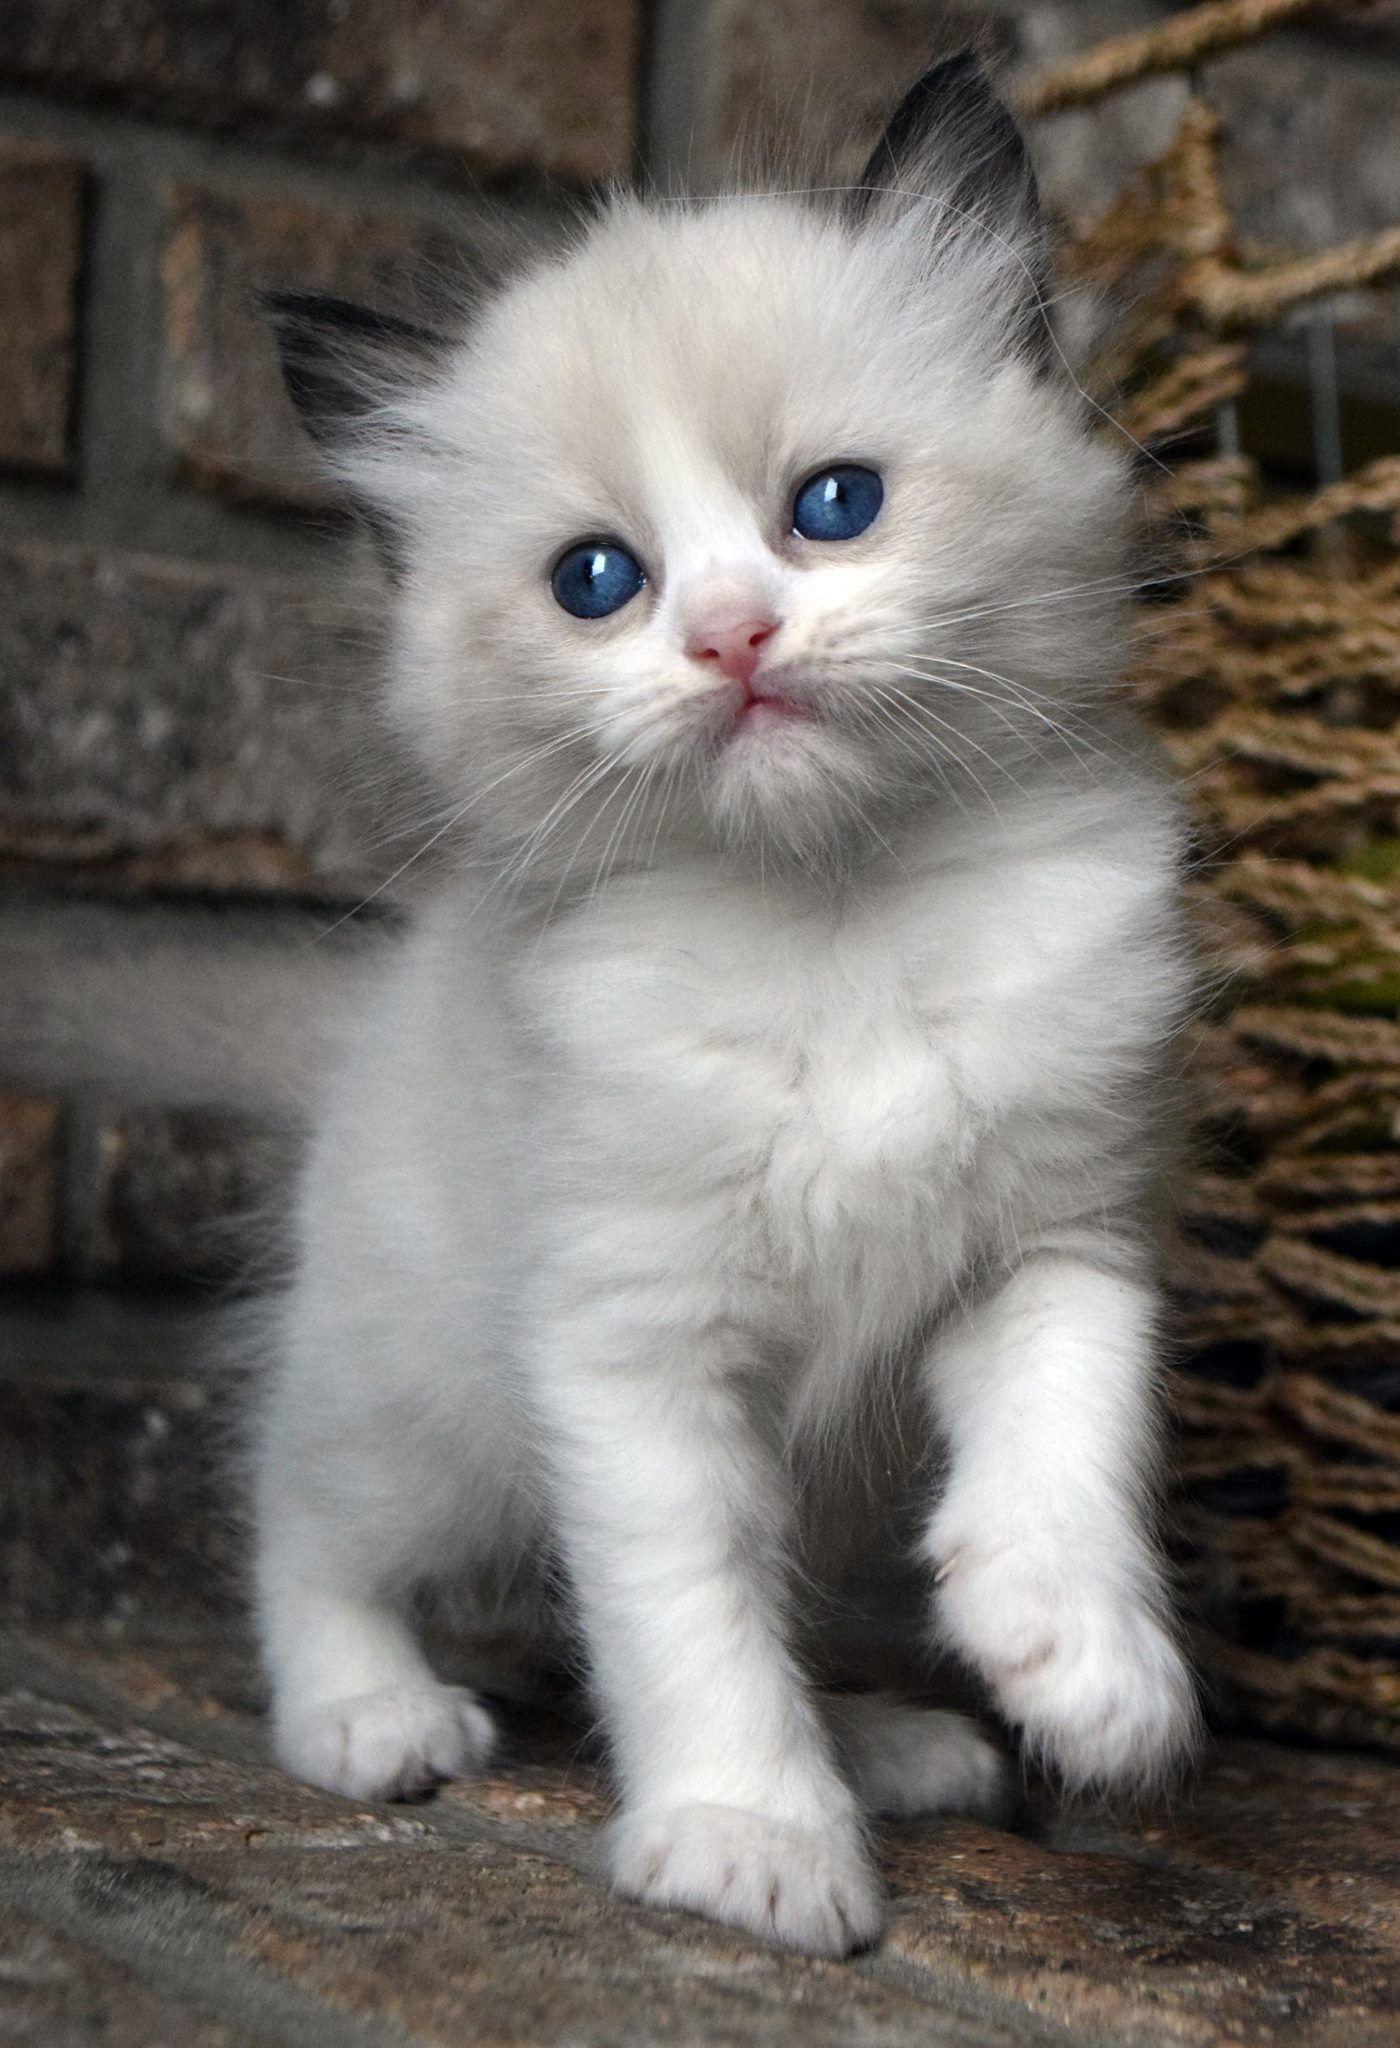 Seal Bi Color Ragdoll Kitten Ohemgee Cats Cat Fluffycat Ragdolls Ragdoll Kittens Sealbicolor Ragdoll Cat Ragdoll Kitten Ragdoll Cats For Sale